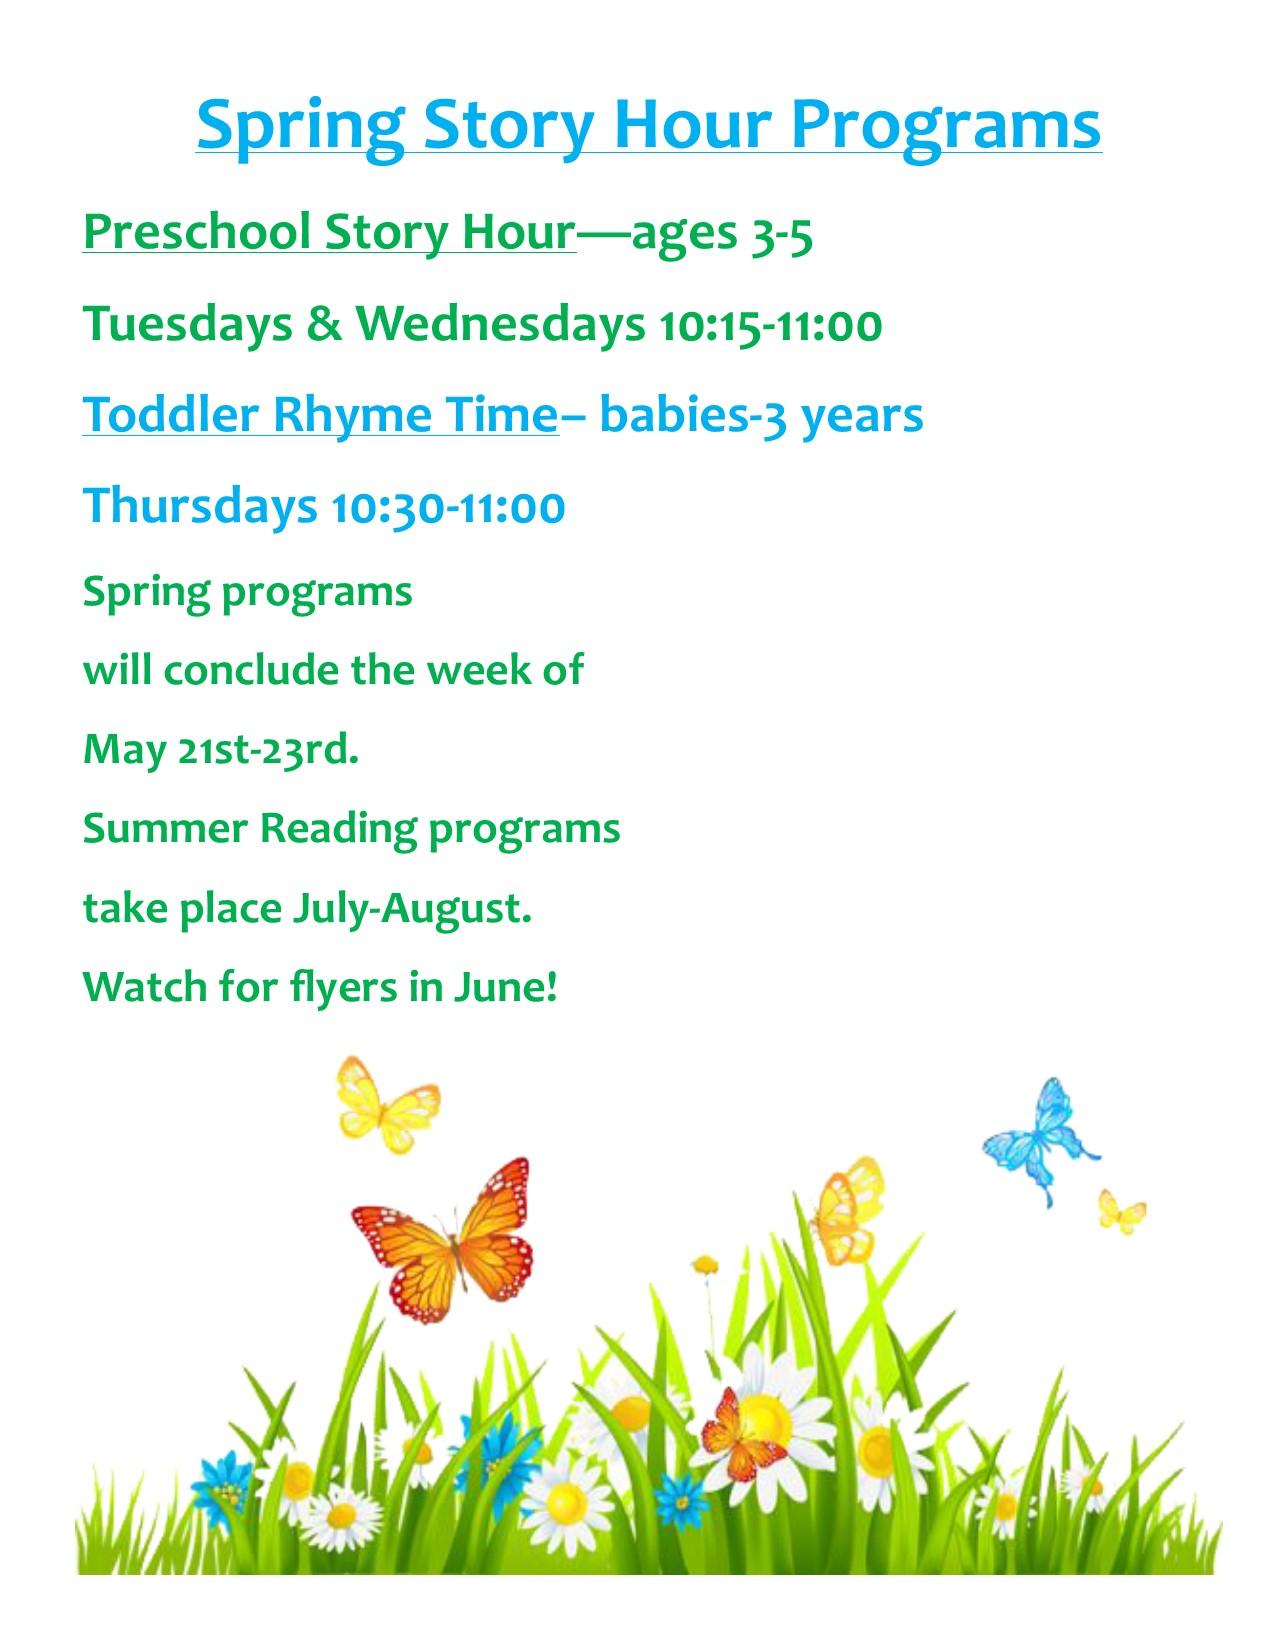 Spring Story Hour Flyer 2019.jpg